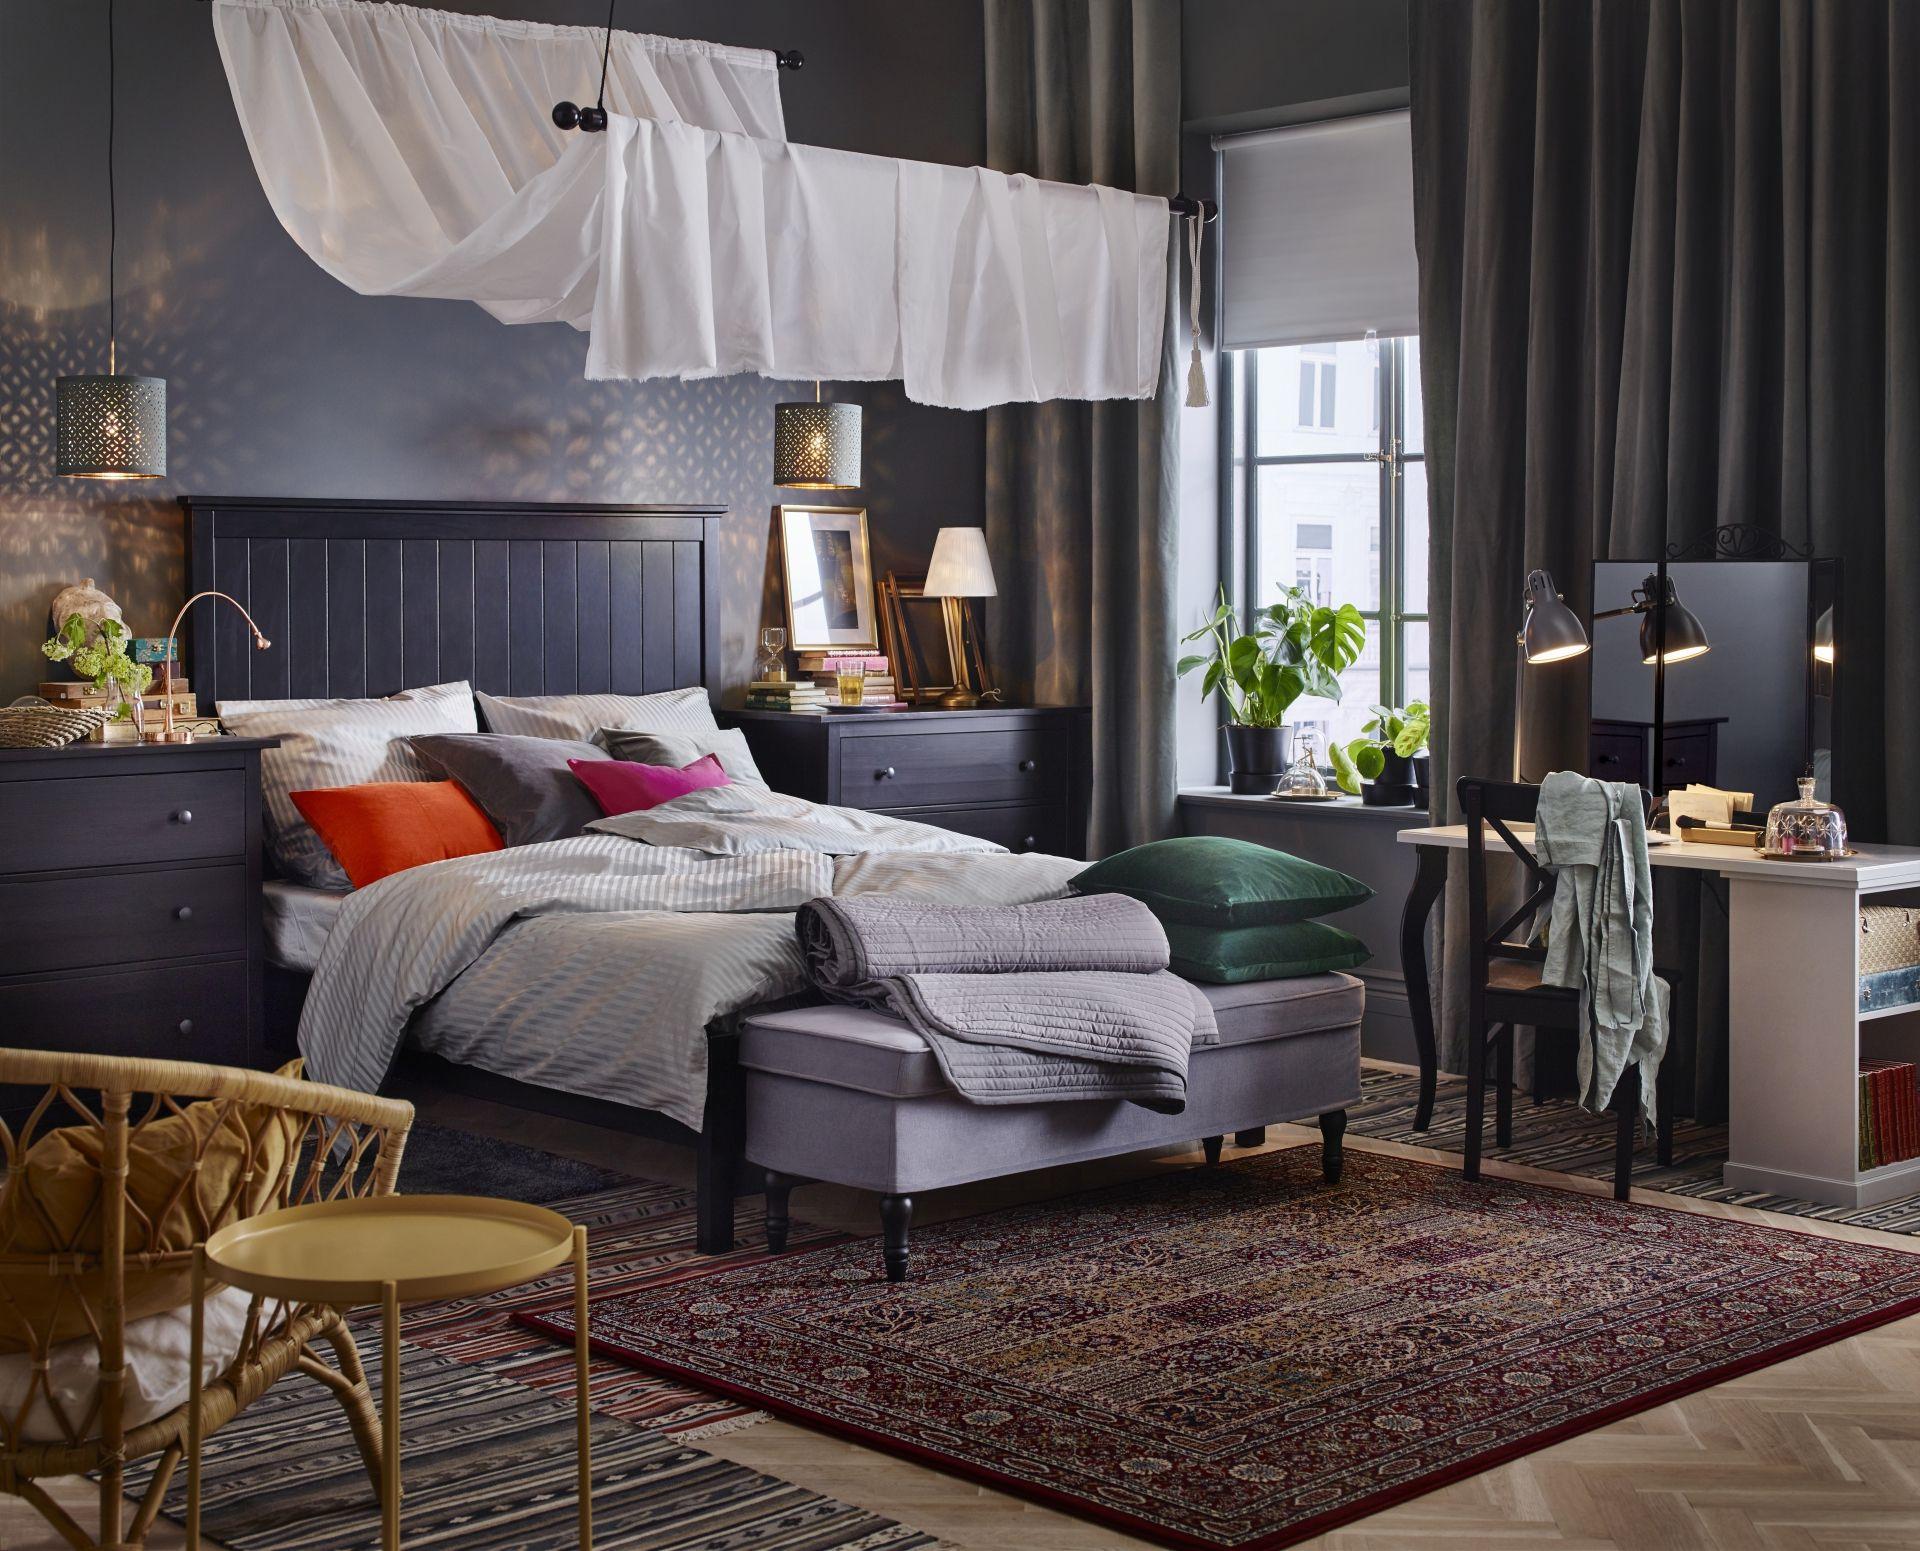 UNDREDAL bedframe | IKEAcatalogus nieuw 2018 IKEA IKEAnl ...